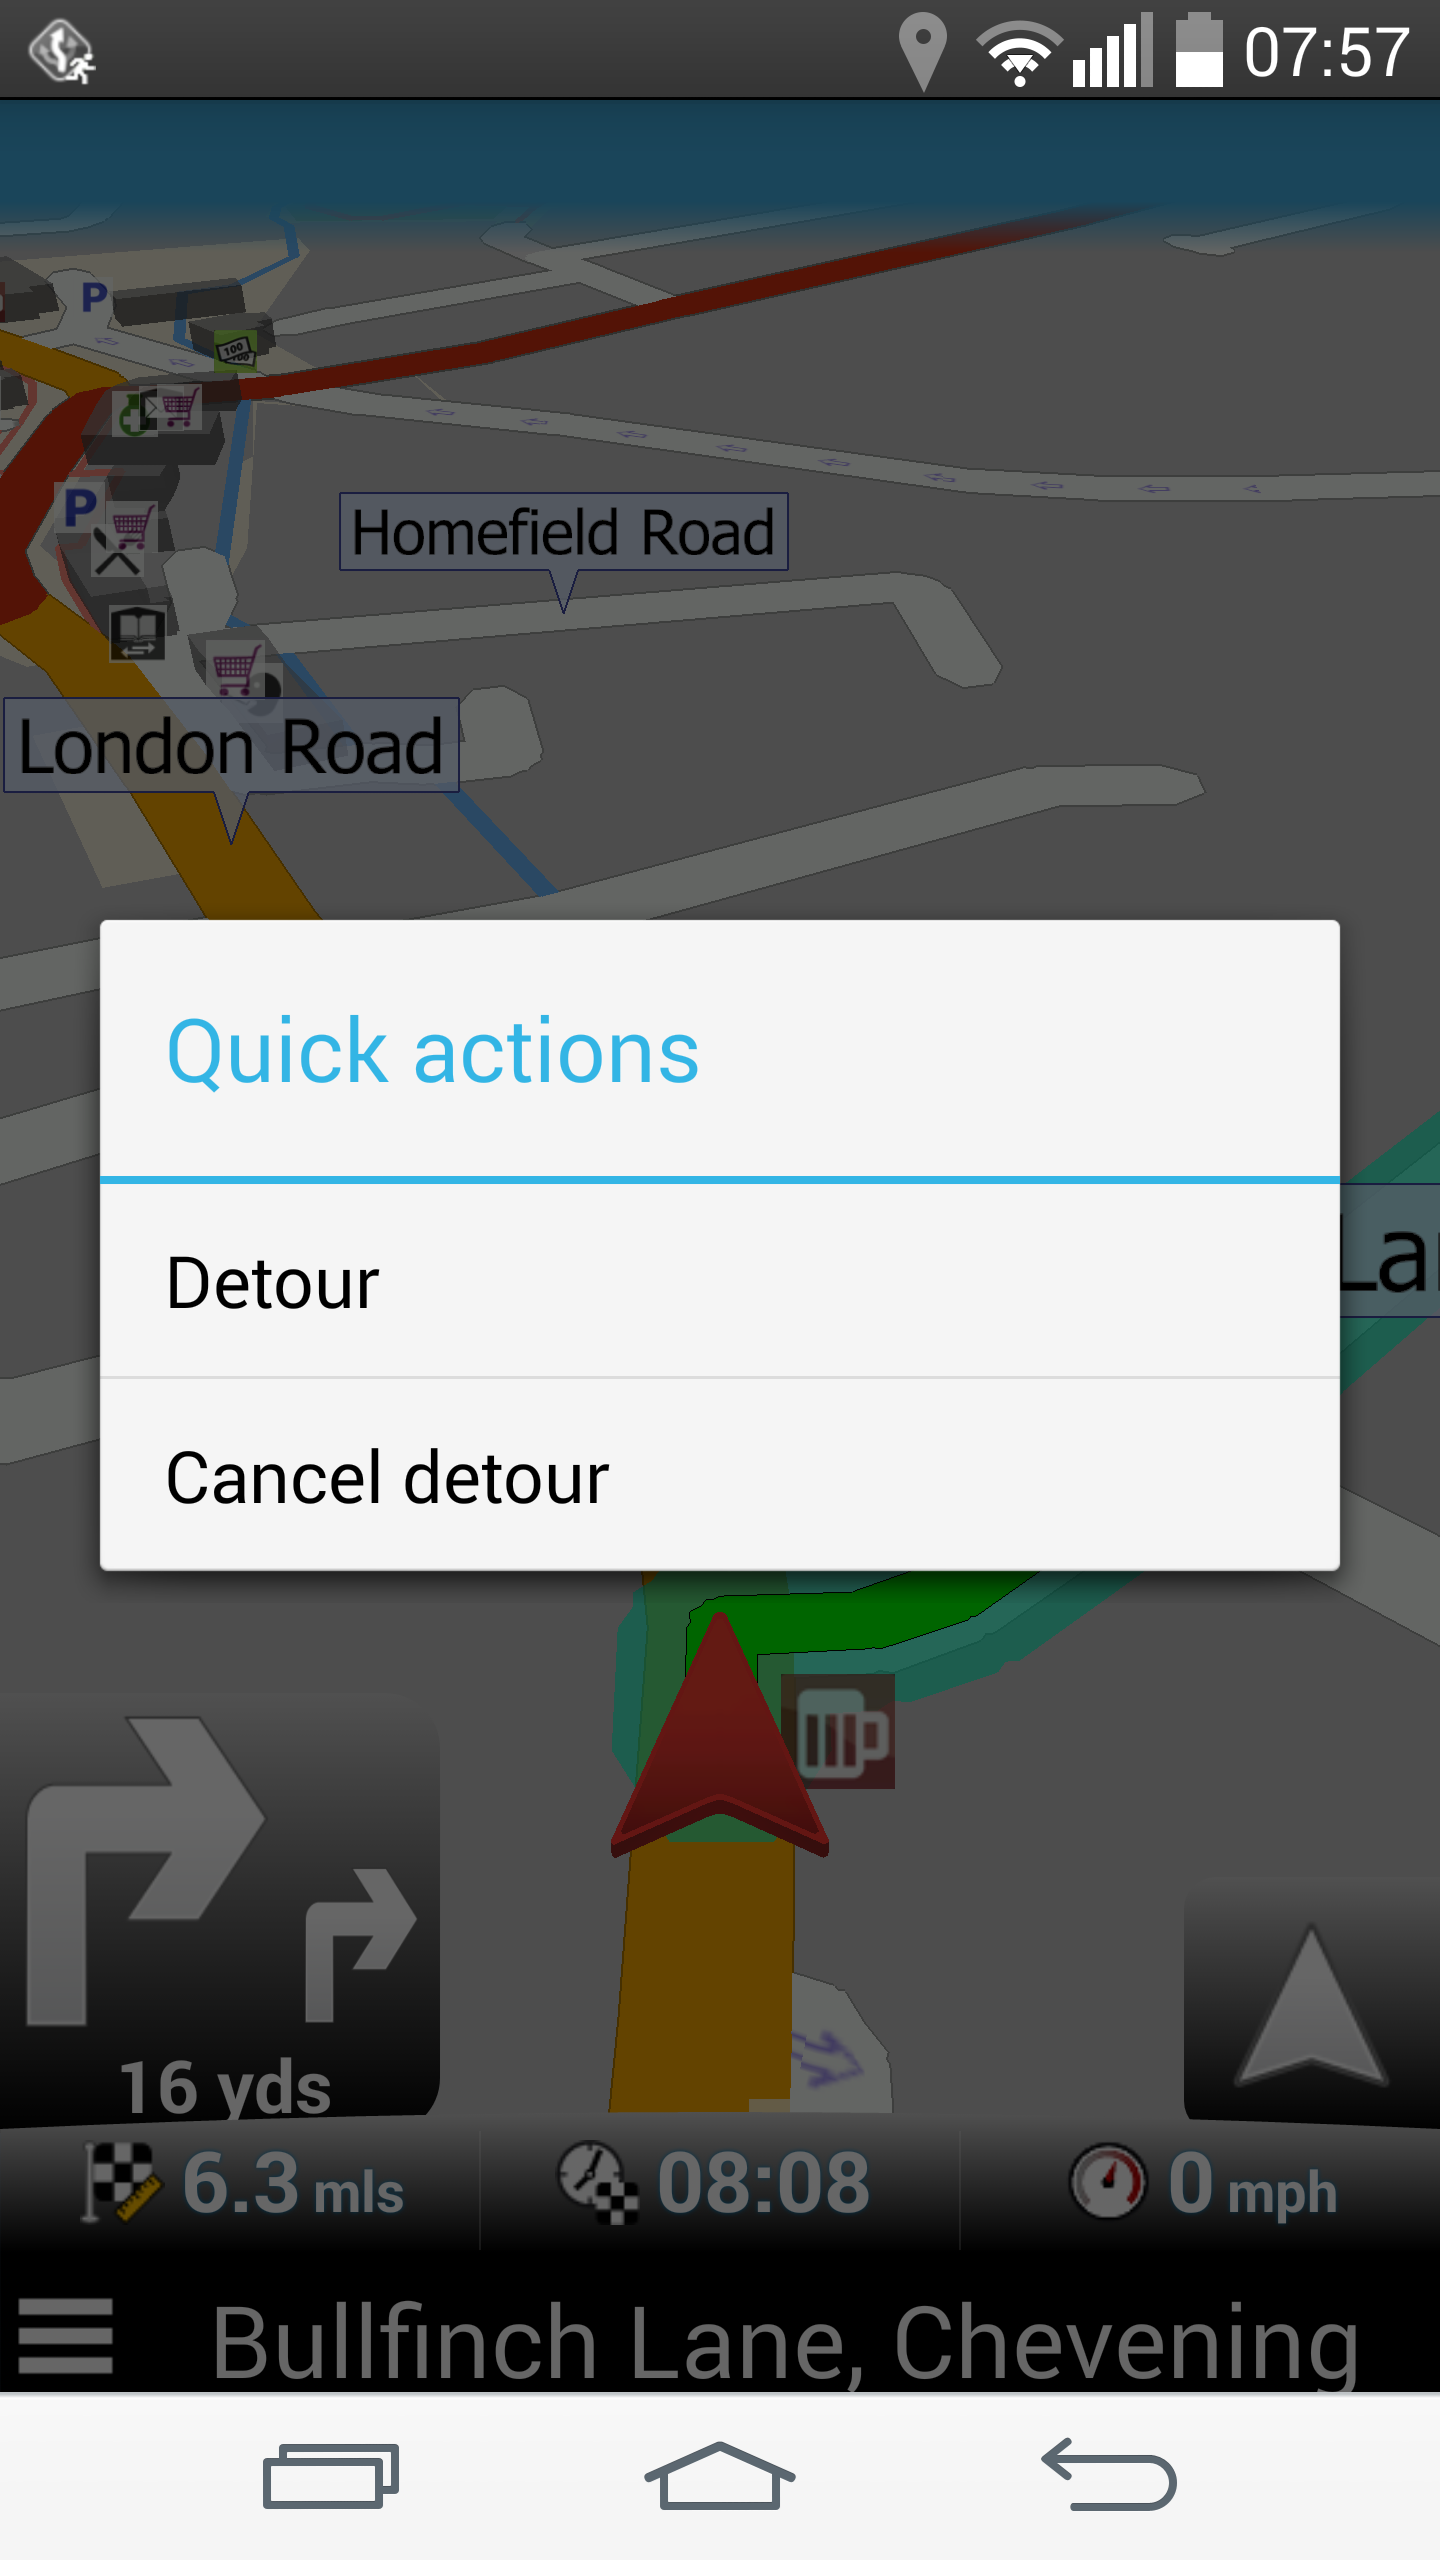 Navigator - Detour cancel